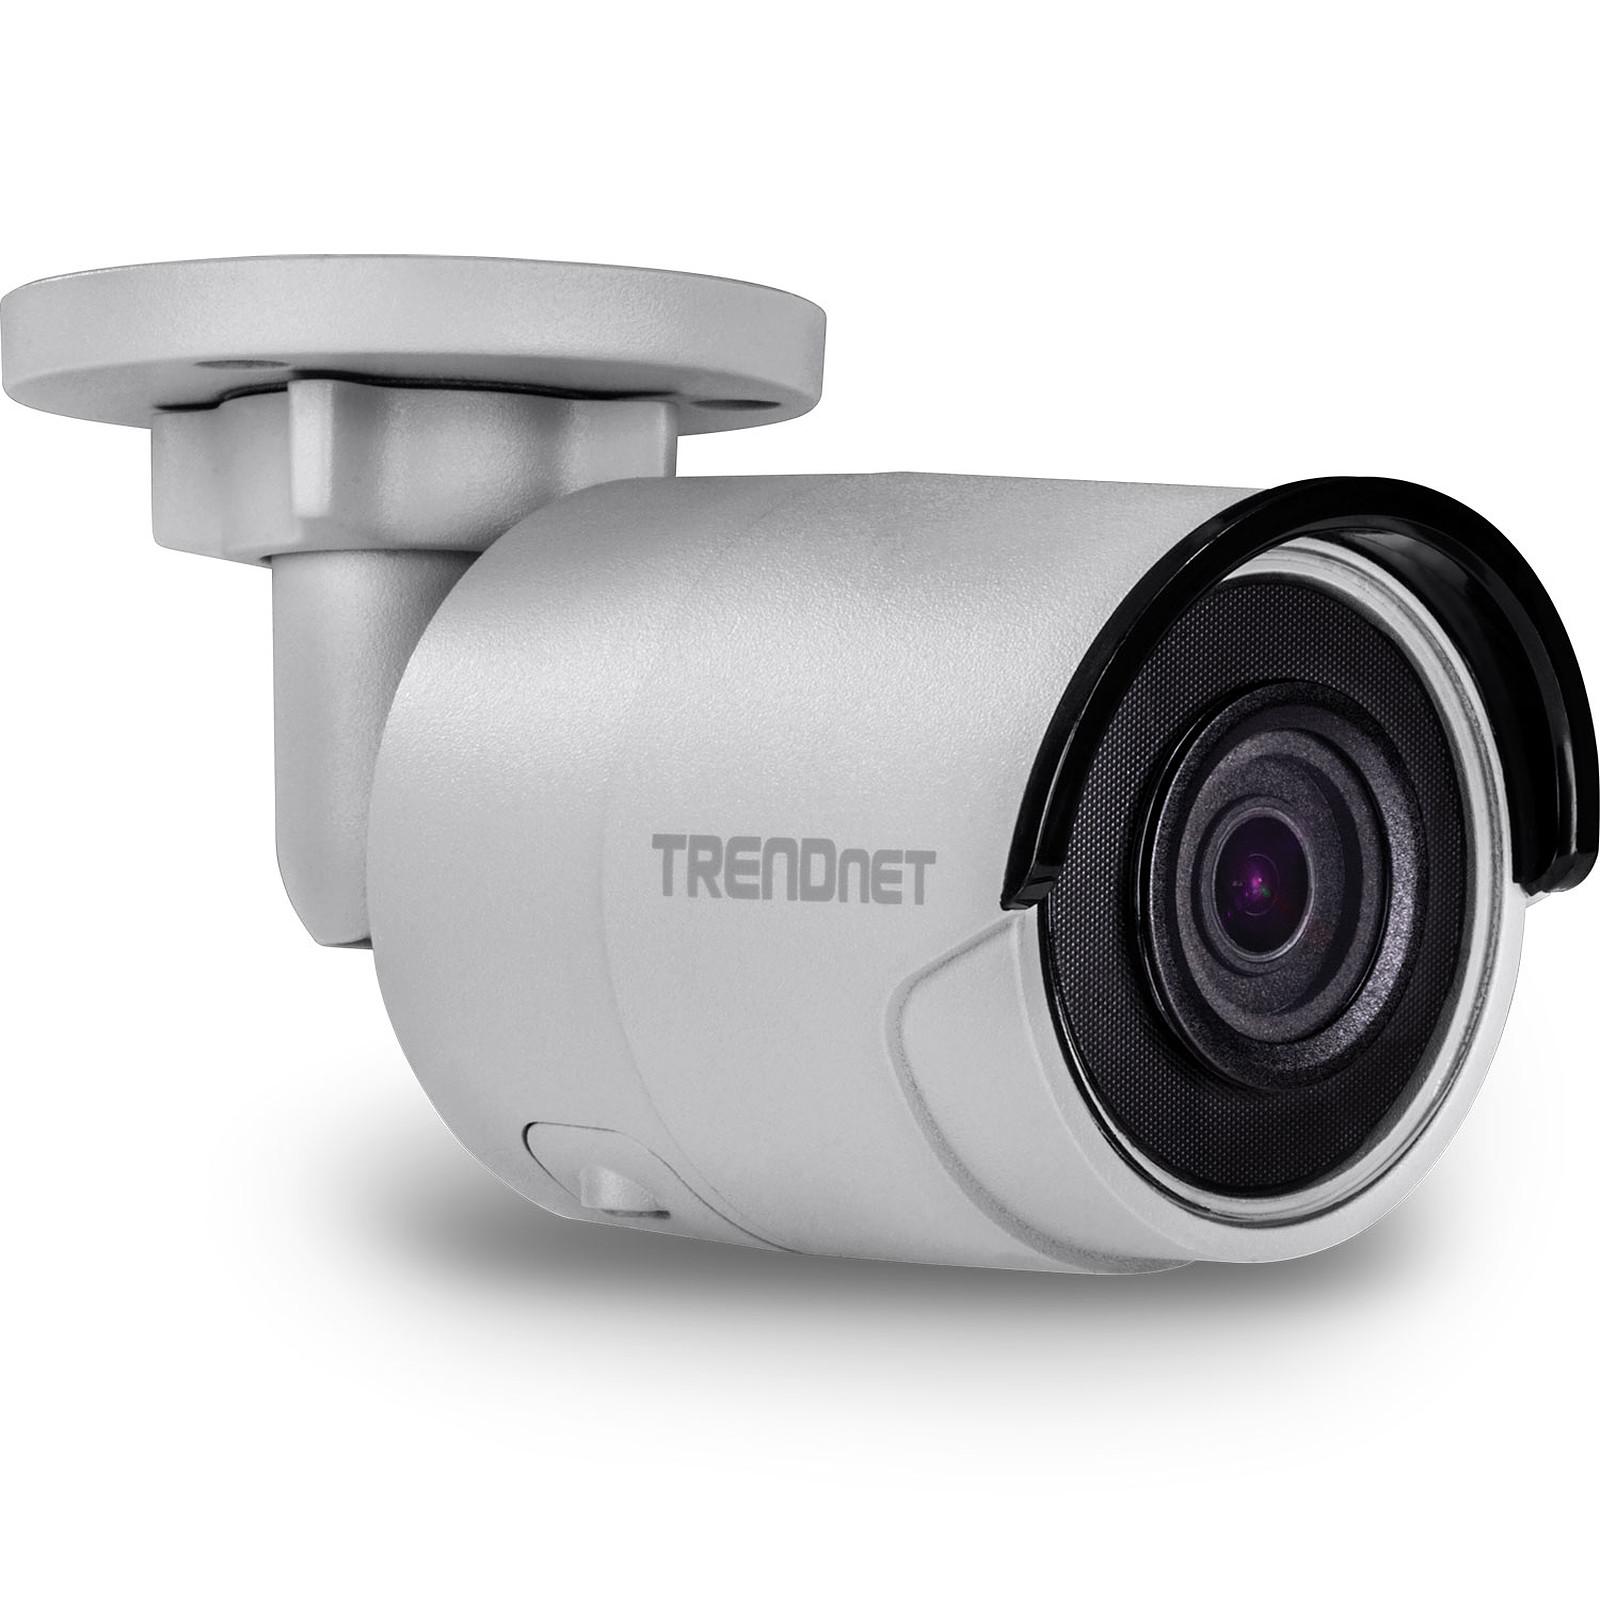 TRENDnet TV-IP316PI